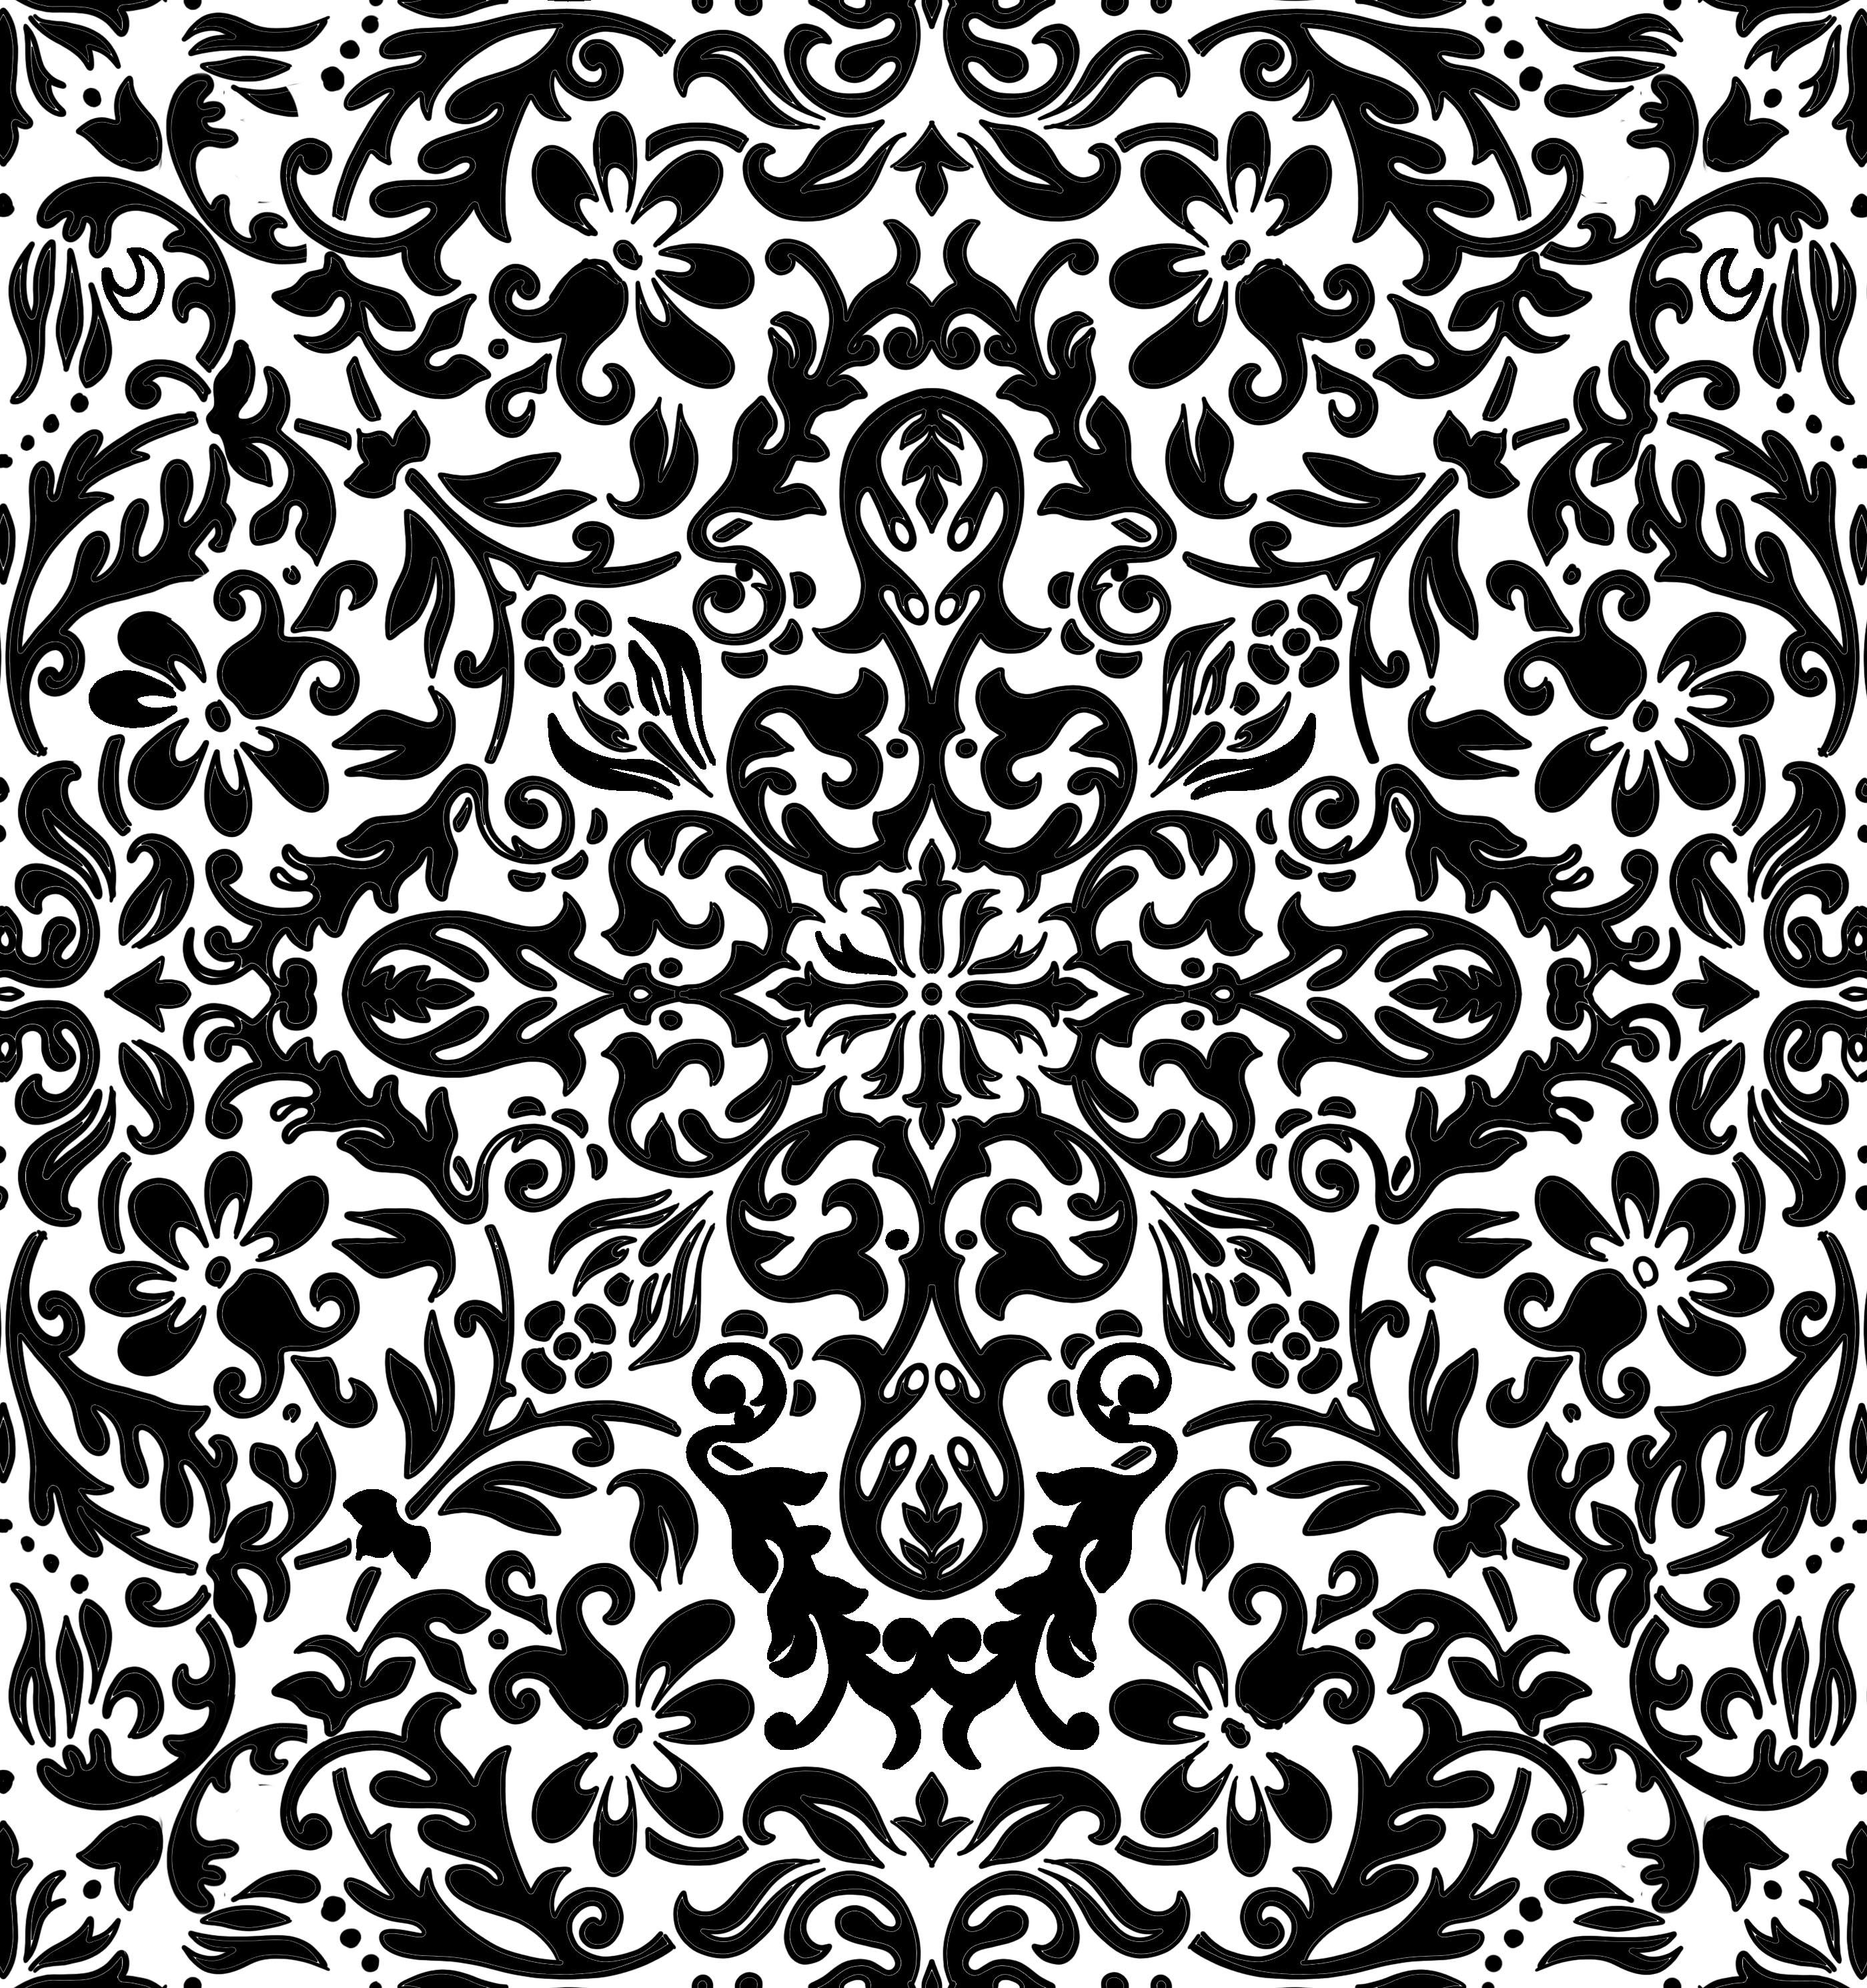 Pattern06 tile